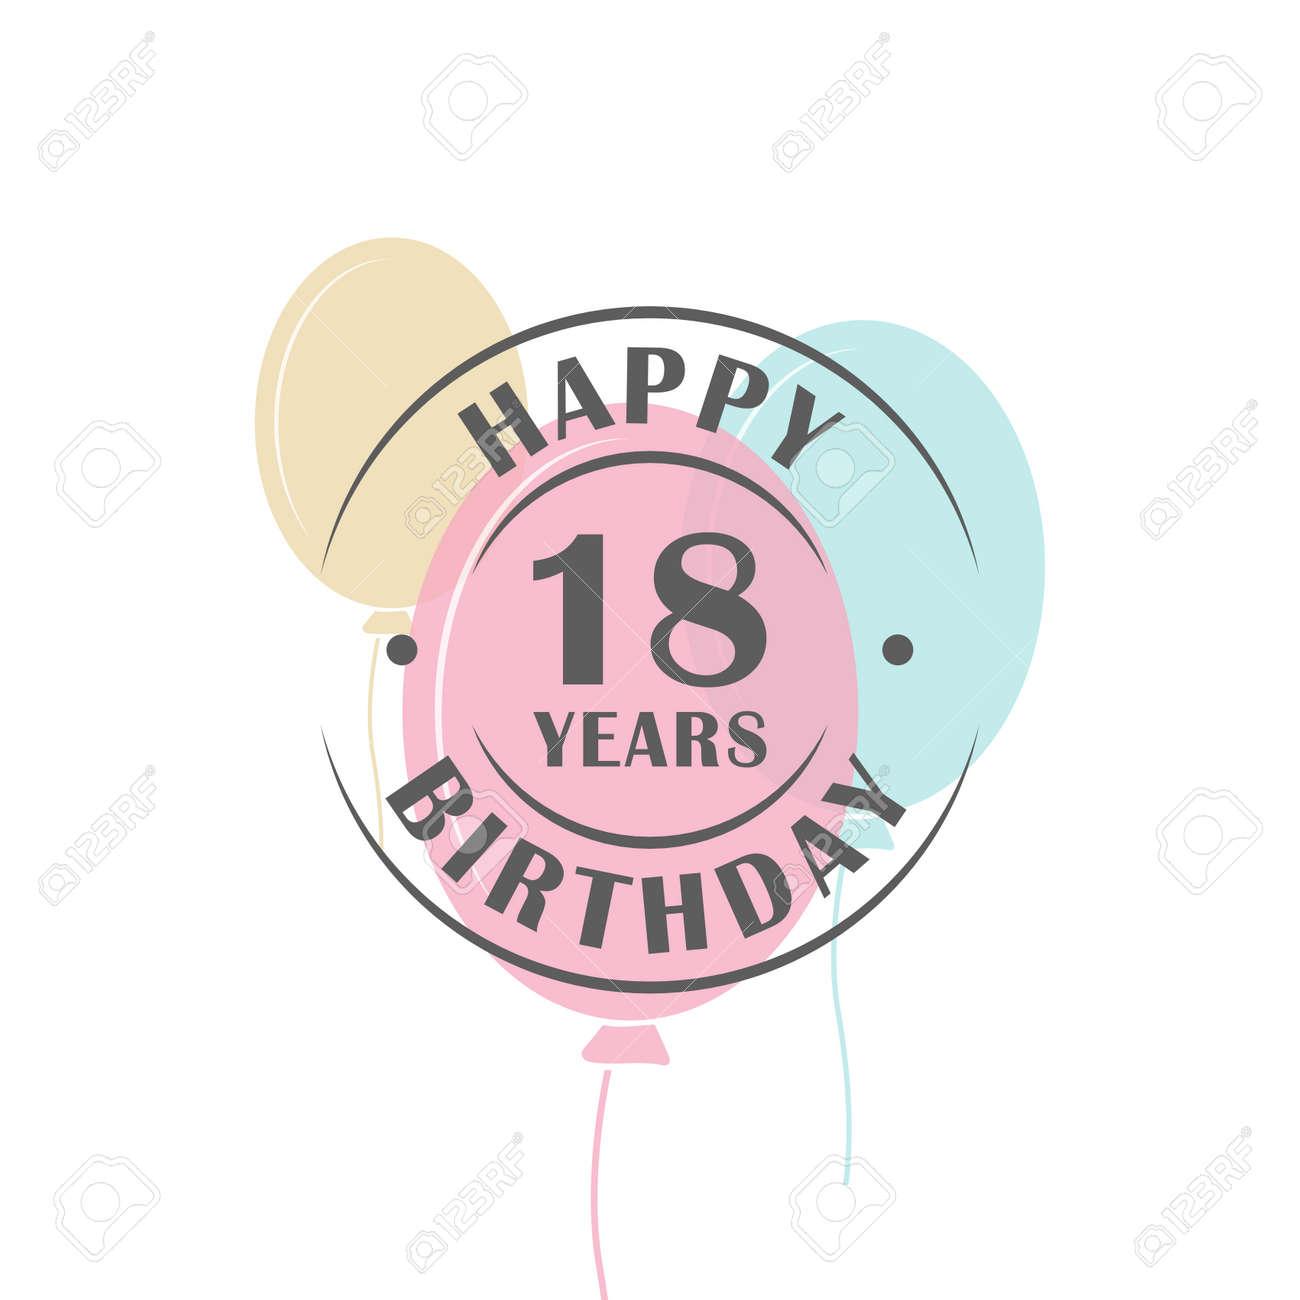 happy birthday 18 jaar Happy Birthday 18 Years Round Logo With Festive Balloons, Greeting  happy birthday 18 jaar